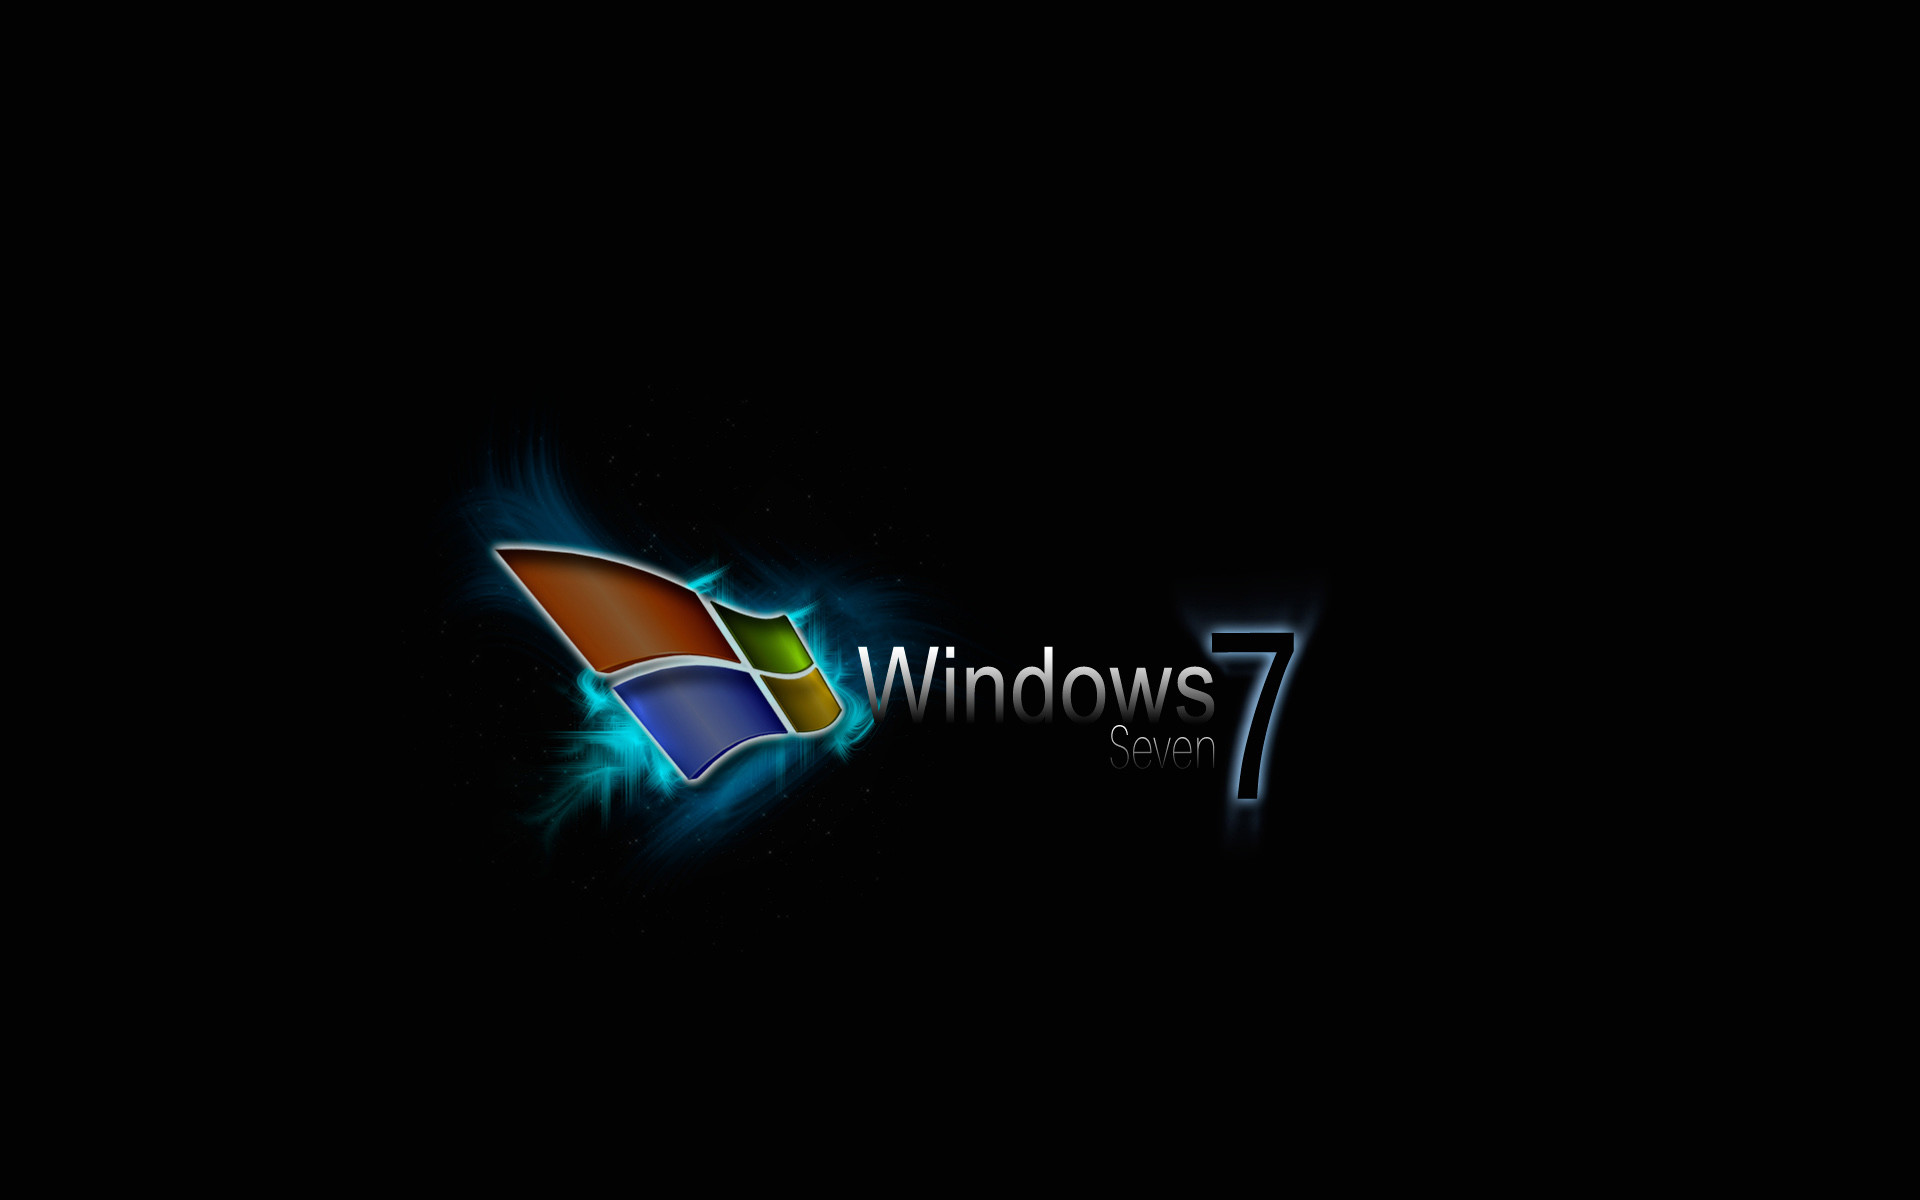 microsoft desktop backgrounds free | Hd microsoft desktop backgrounds .